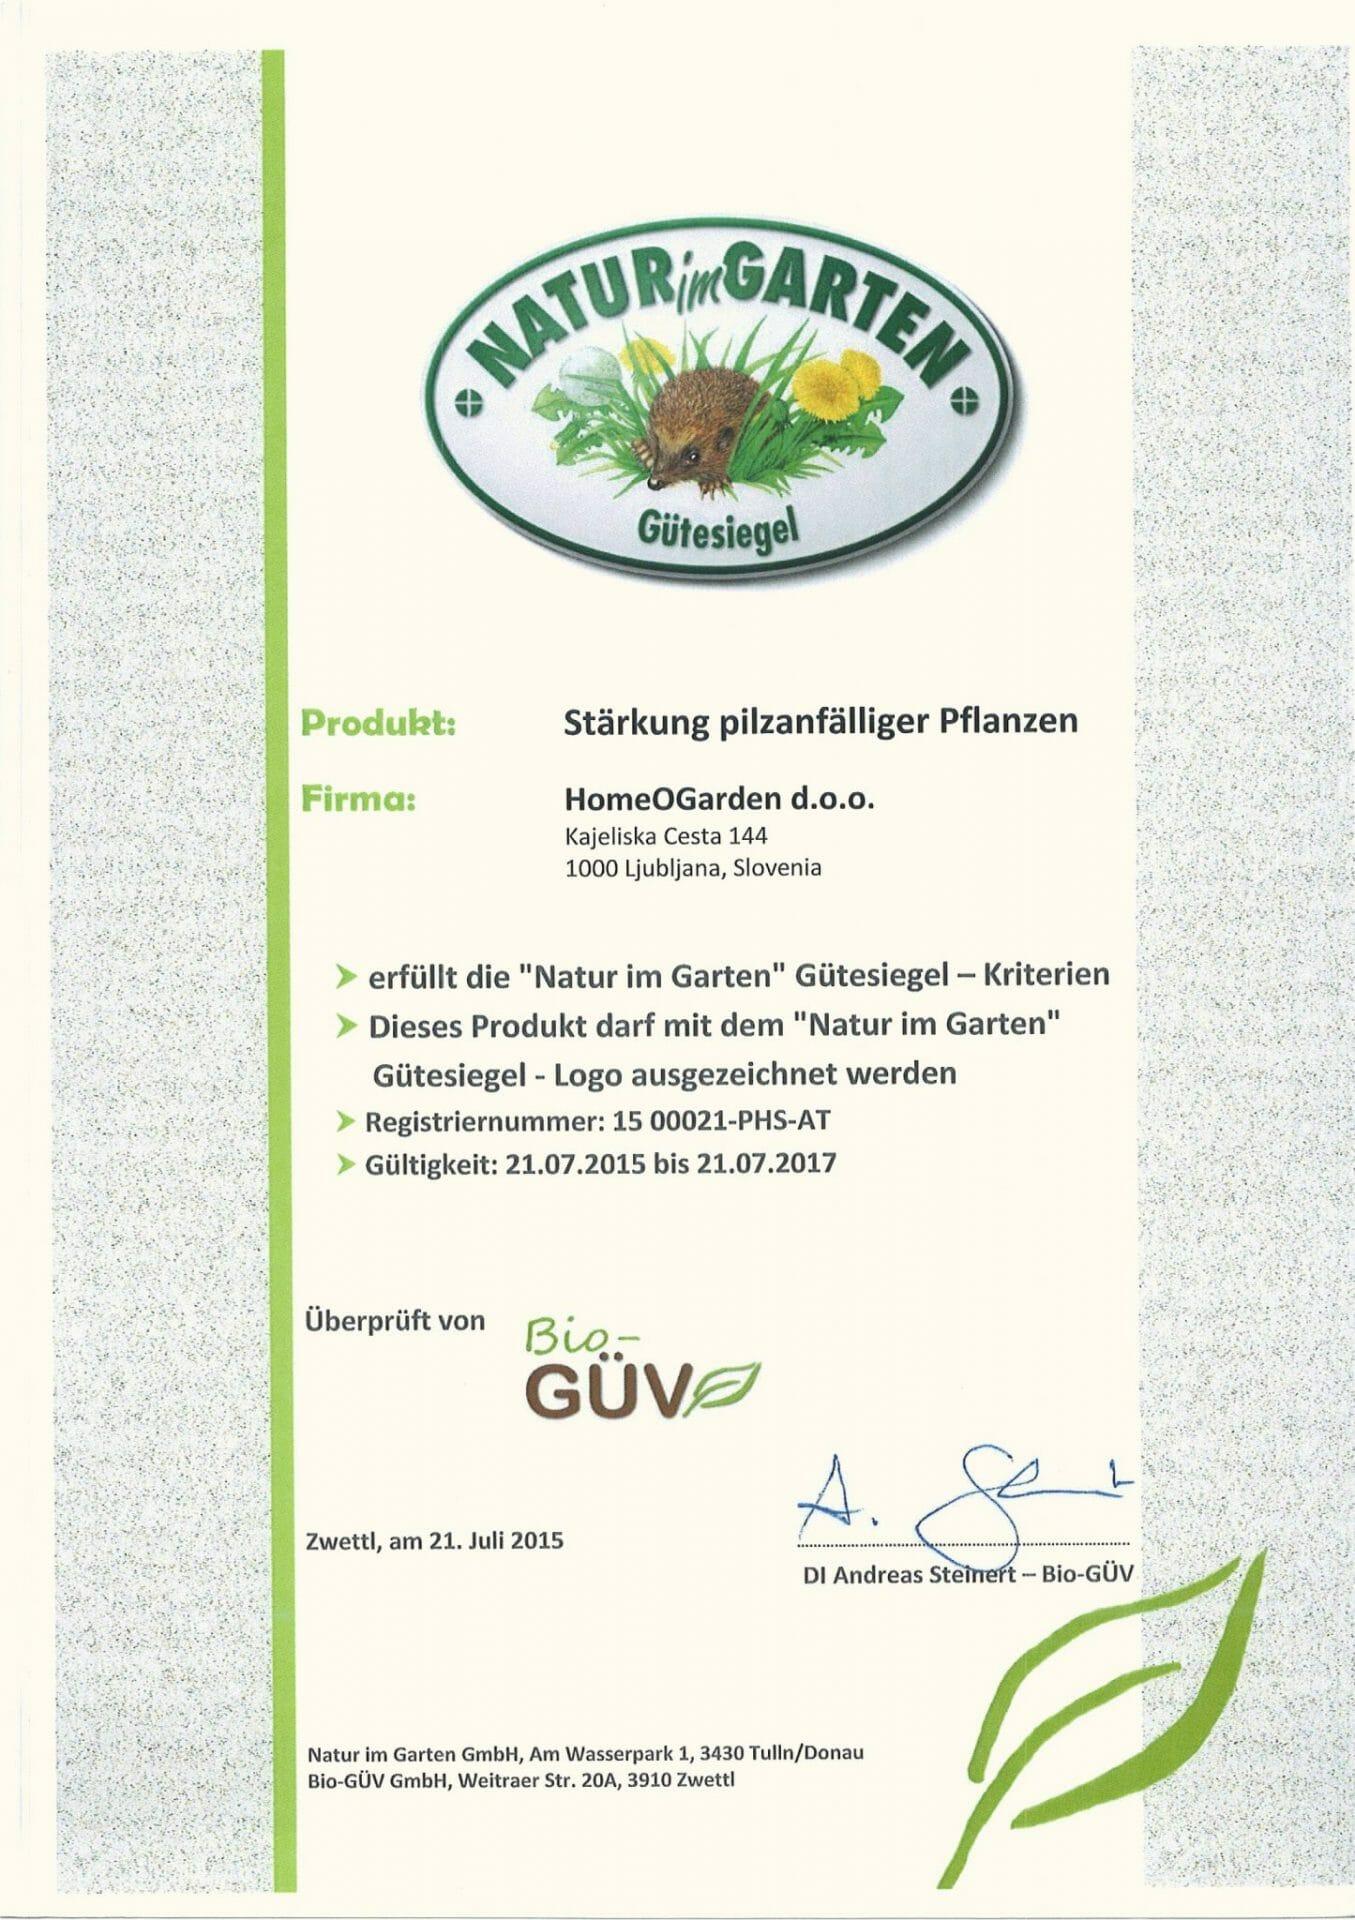 Stärkung-pilzanfälliger-Pflanzen